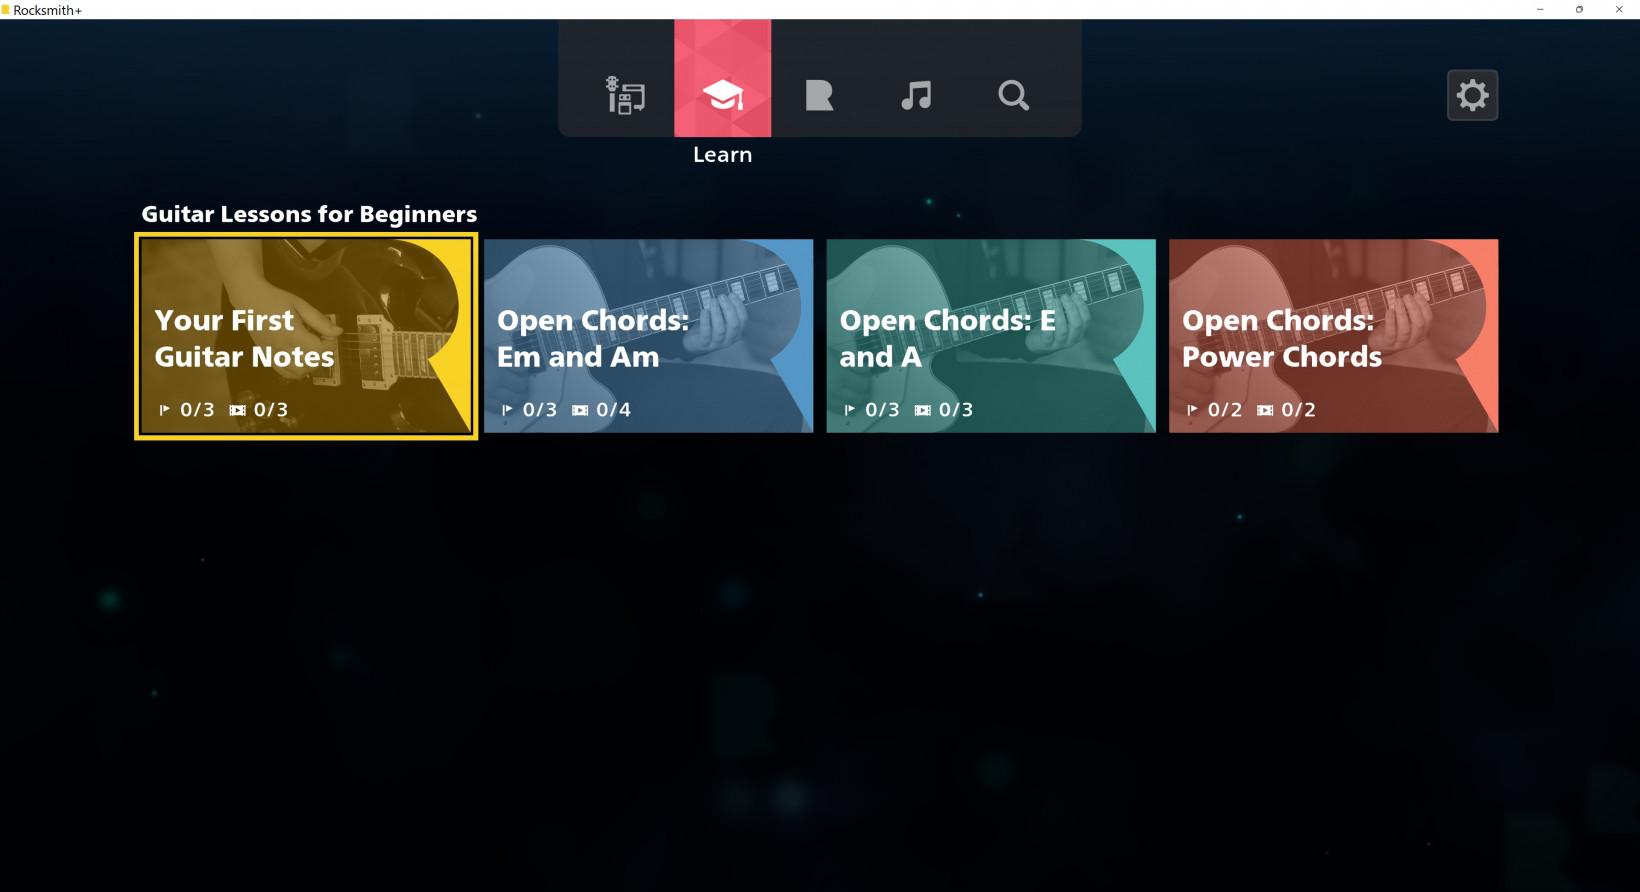 A screen capture of a Rocksmith menu.